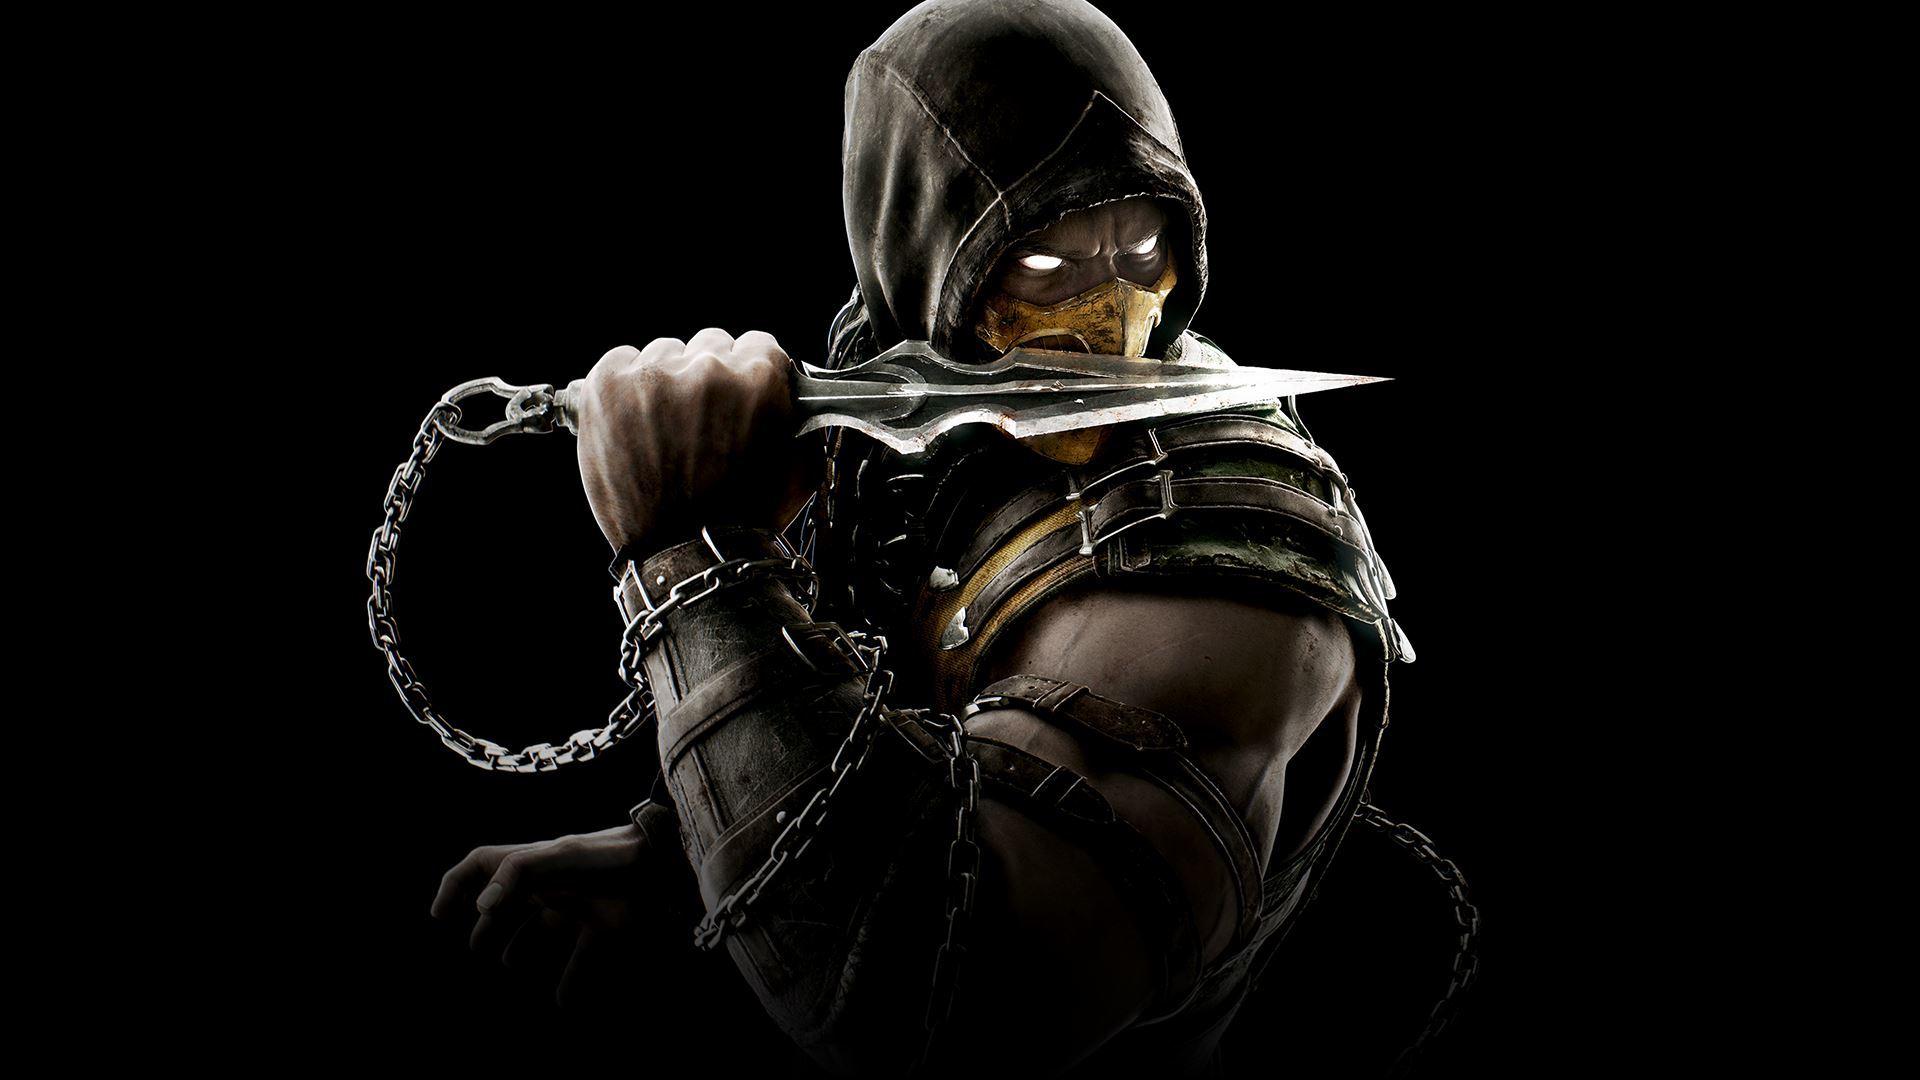 mortal-kombat-x-netherrealm-2753.jpg - Mortal Kombat X scorpion